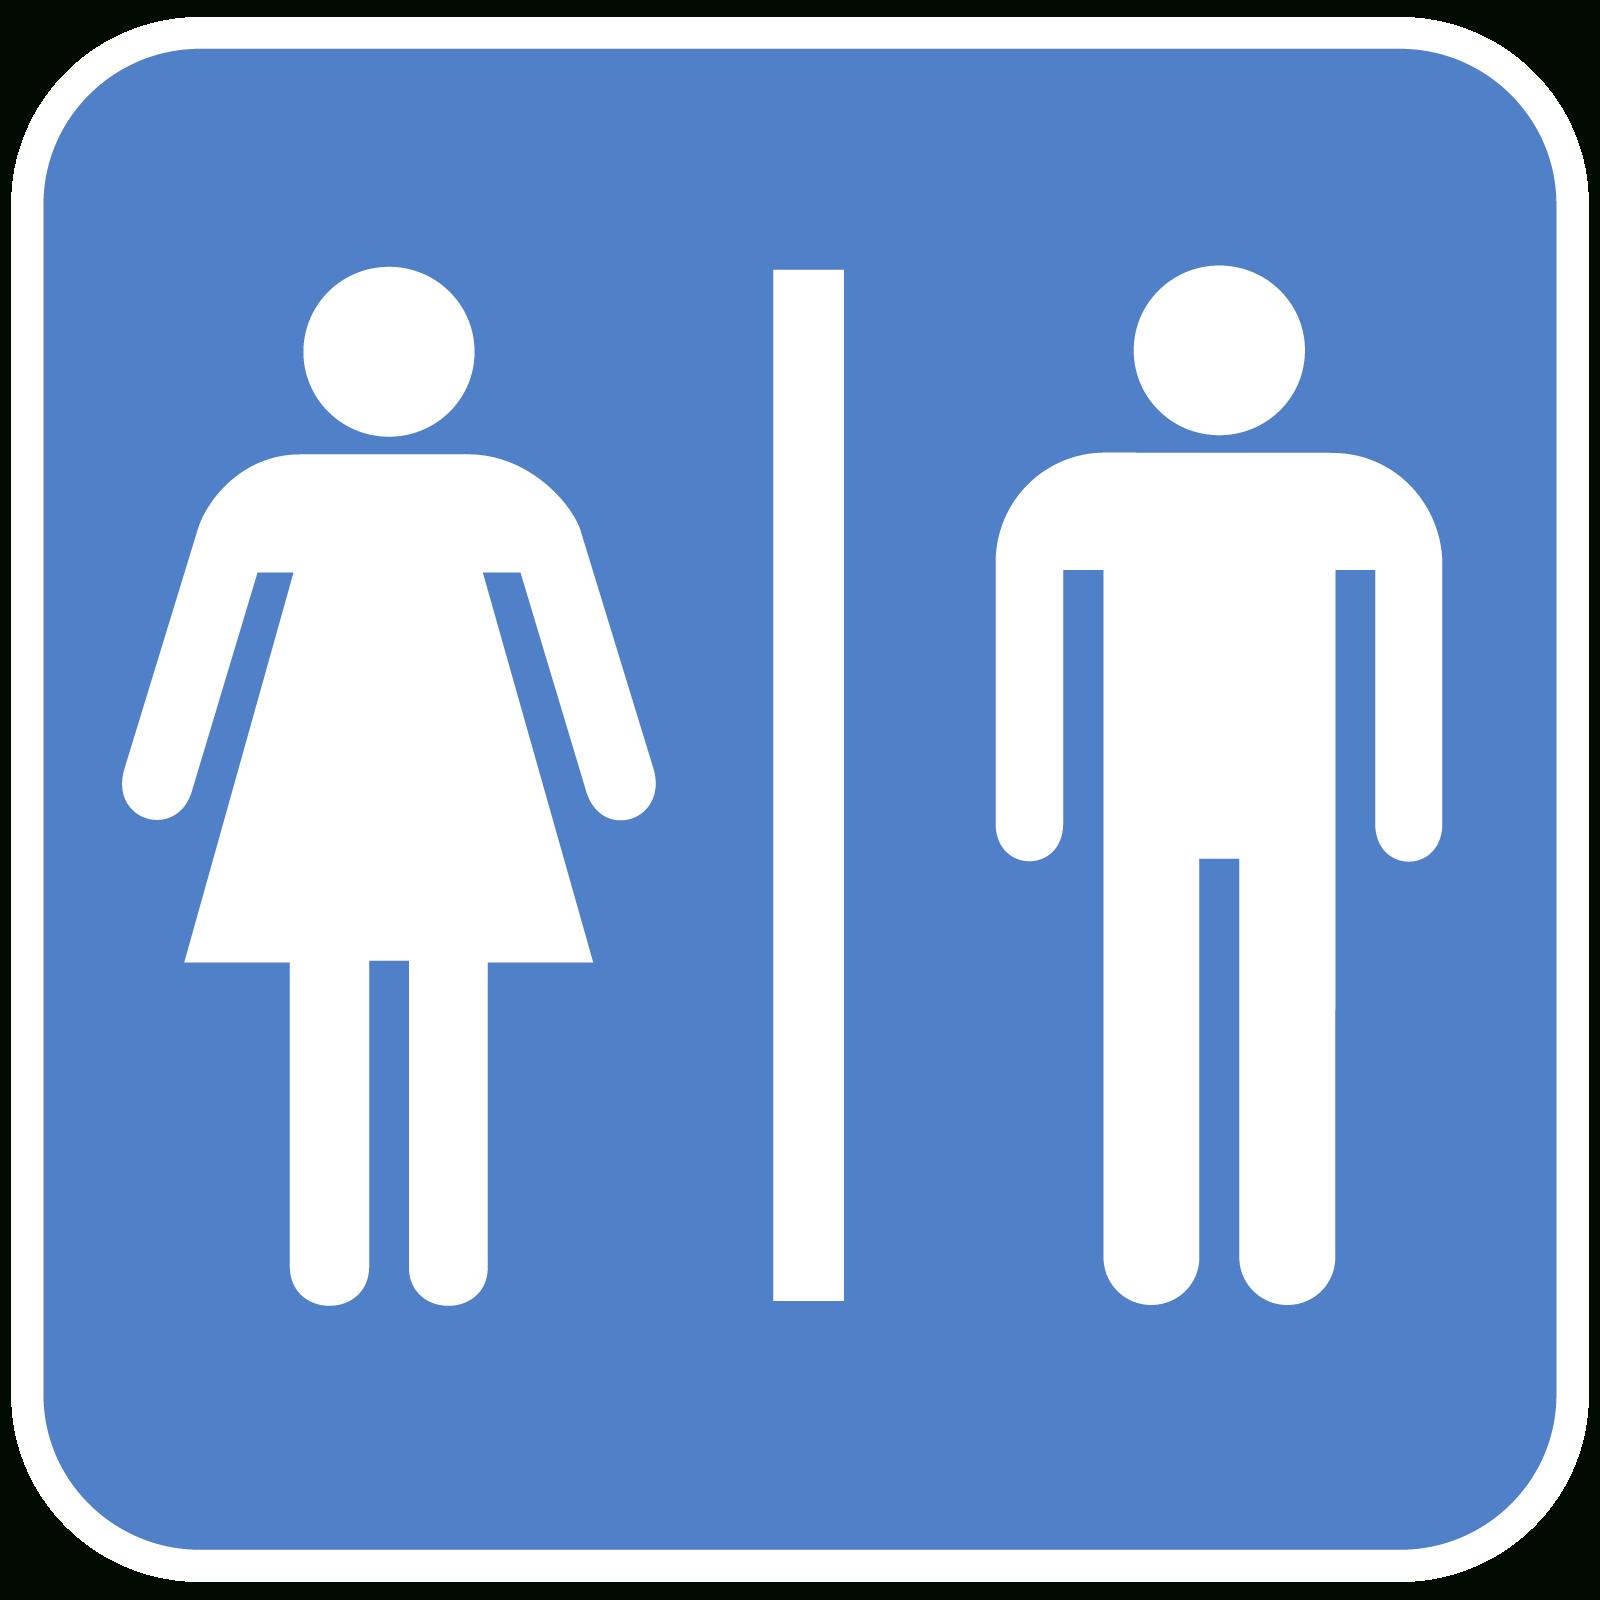 Free Free Printable Restroom Signs, Download Free Clip Art, Free - Free Printable Bathroom Signs